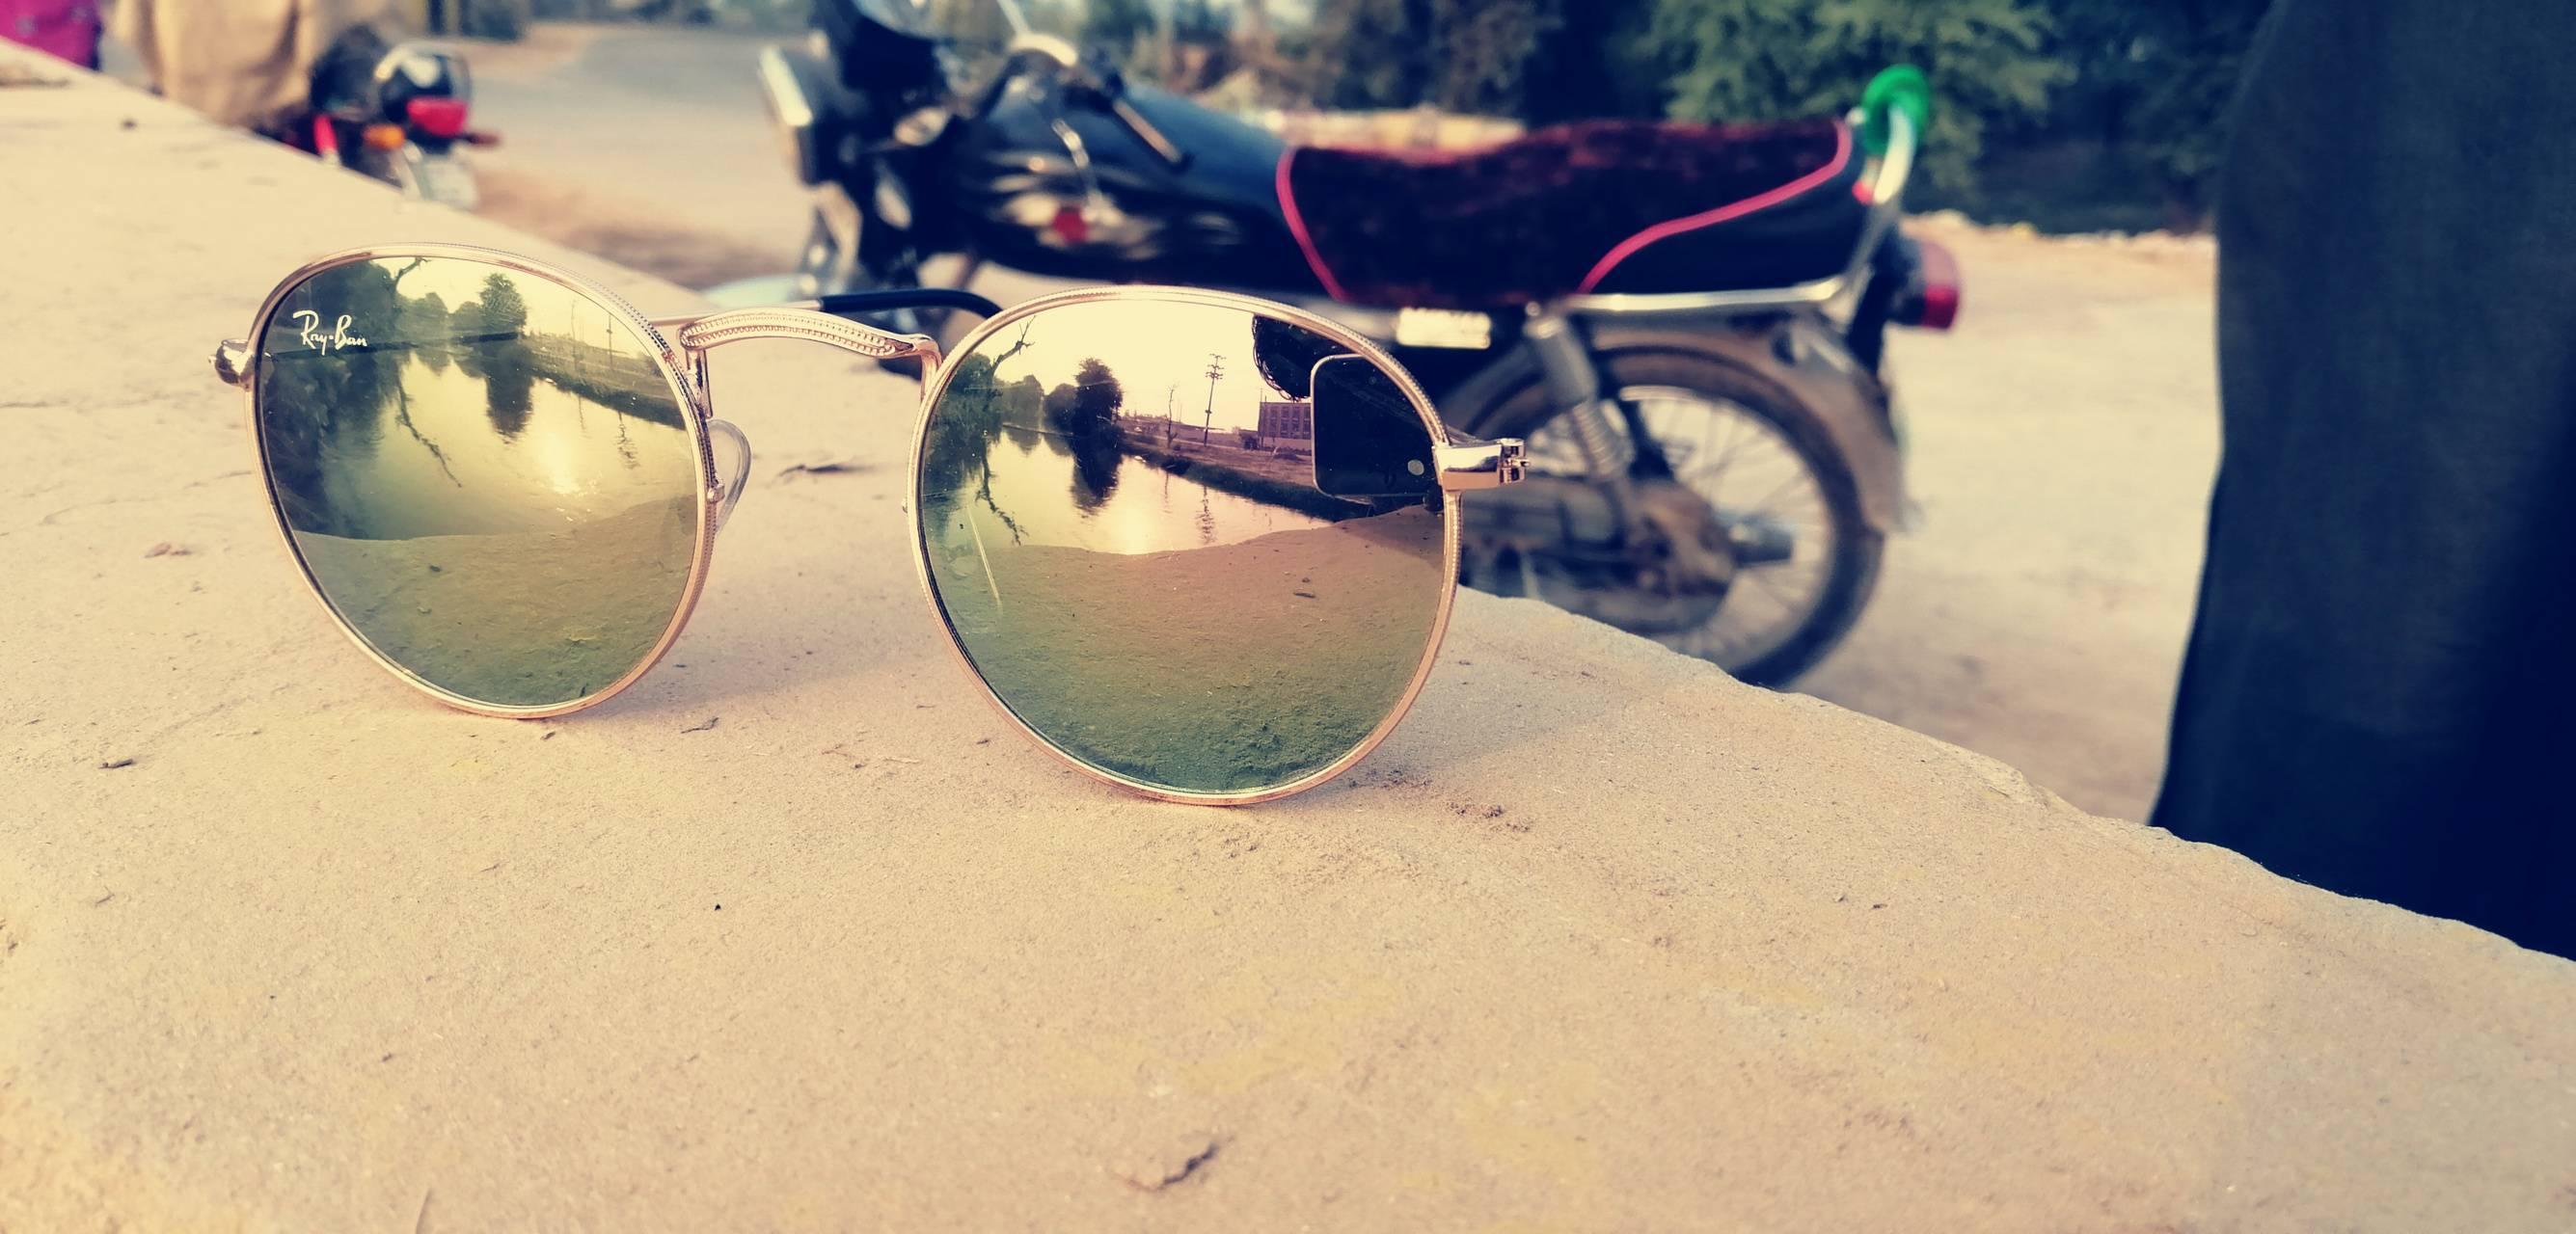 Sunset in glasses